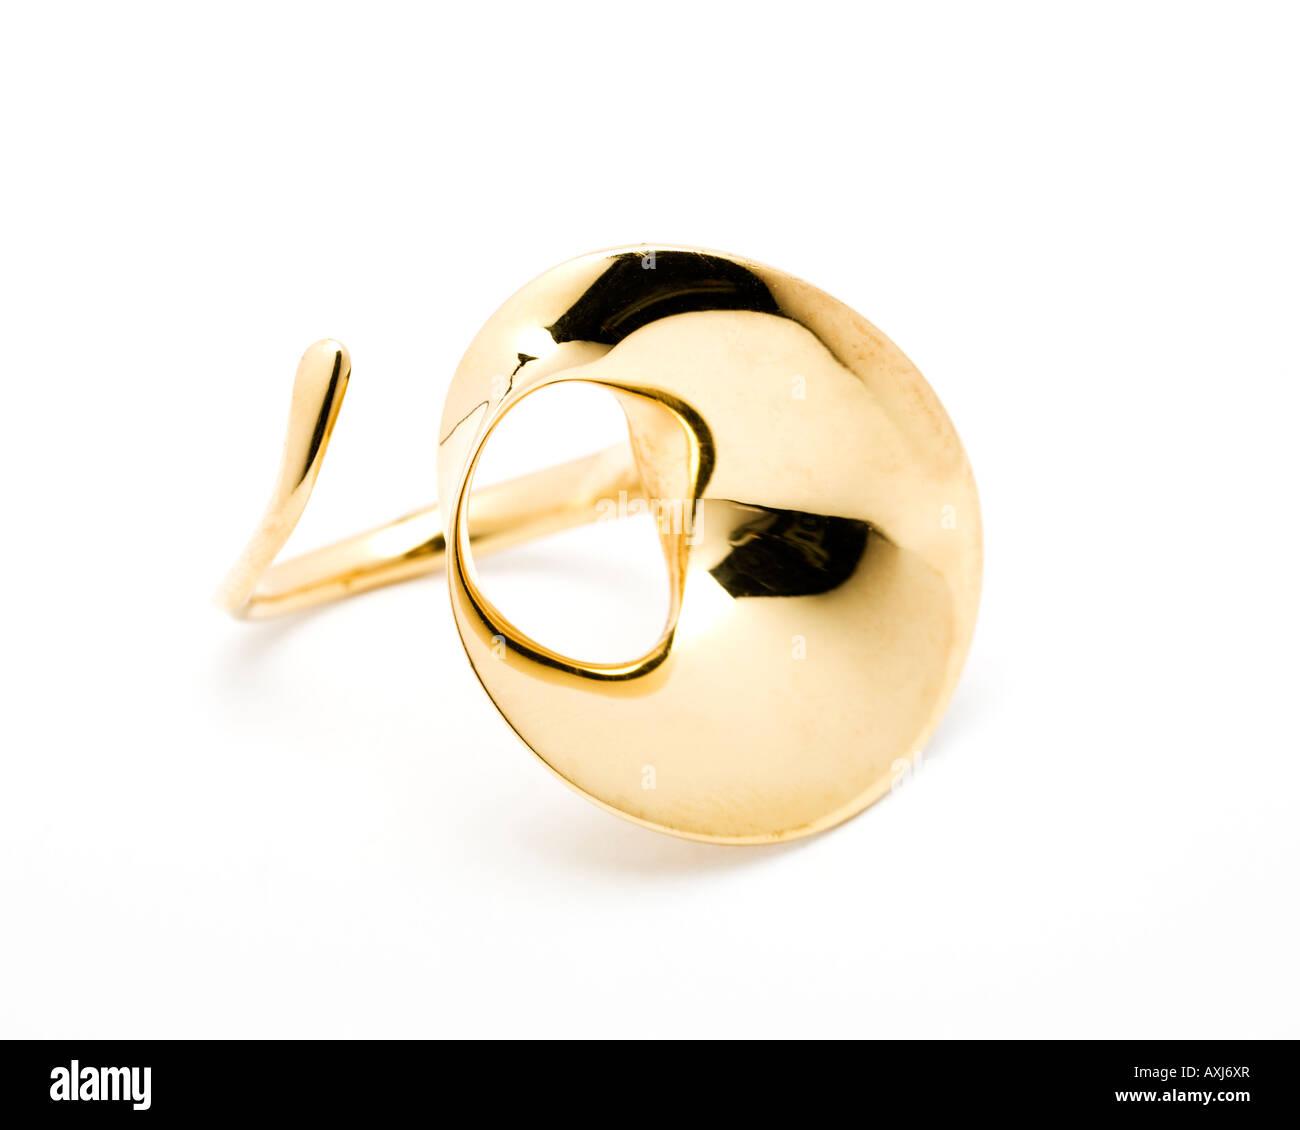 Georg Jensen vintage gold ring jewellery - Stock Image